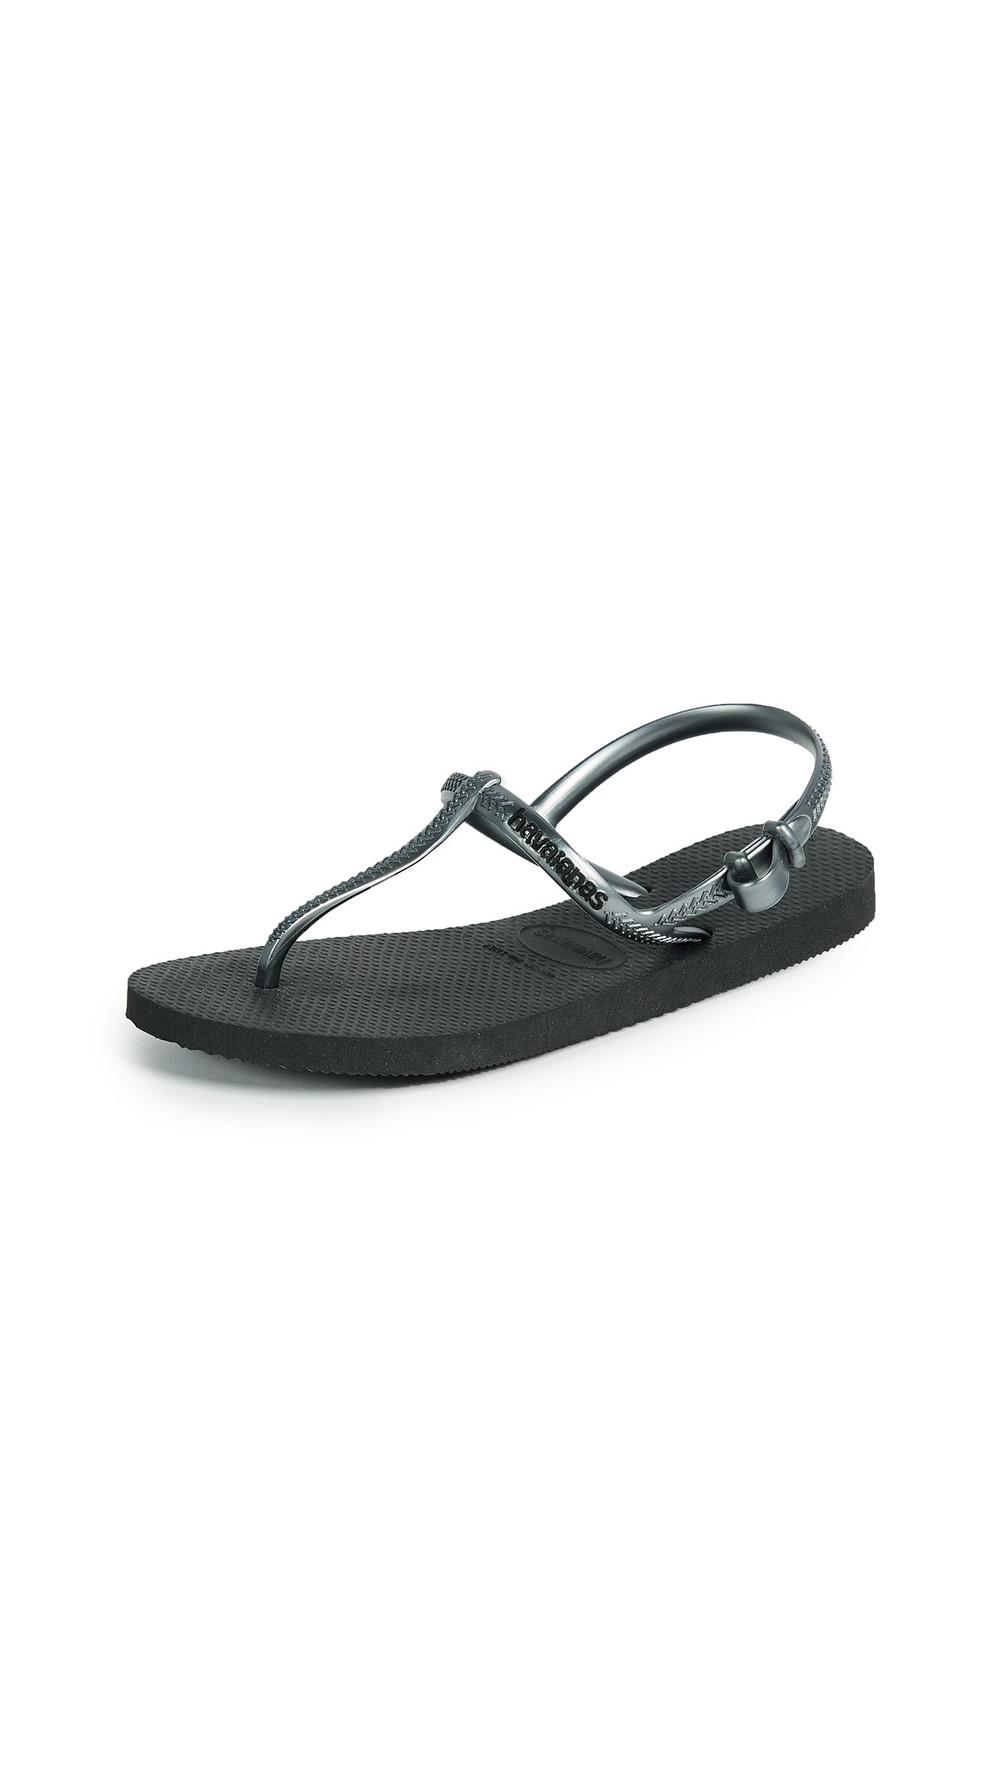 Havaianas Freedom T Strap Sandals in black